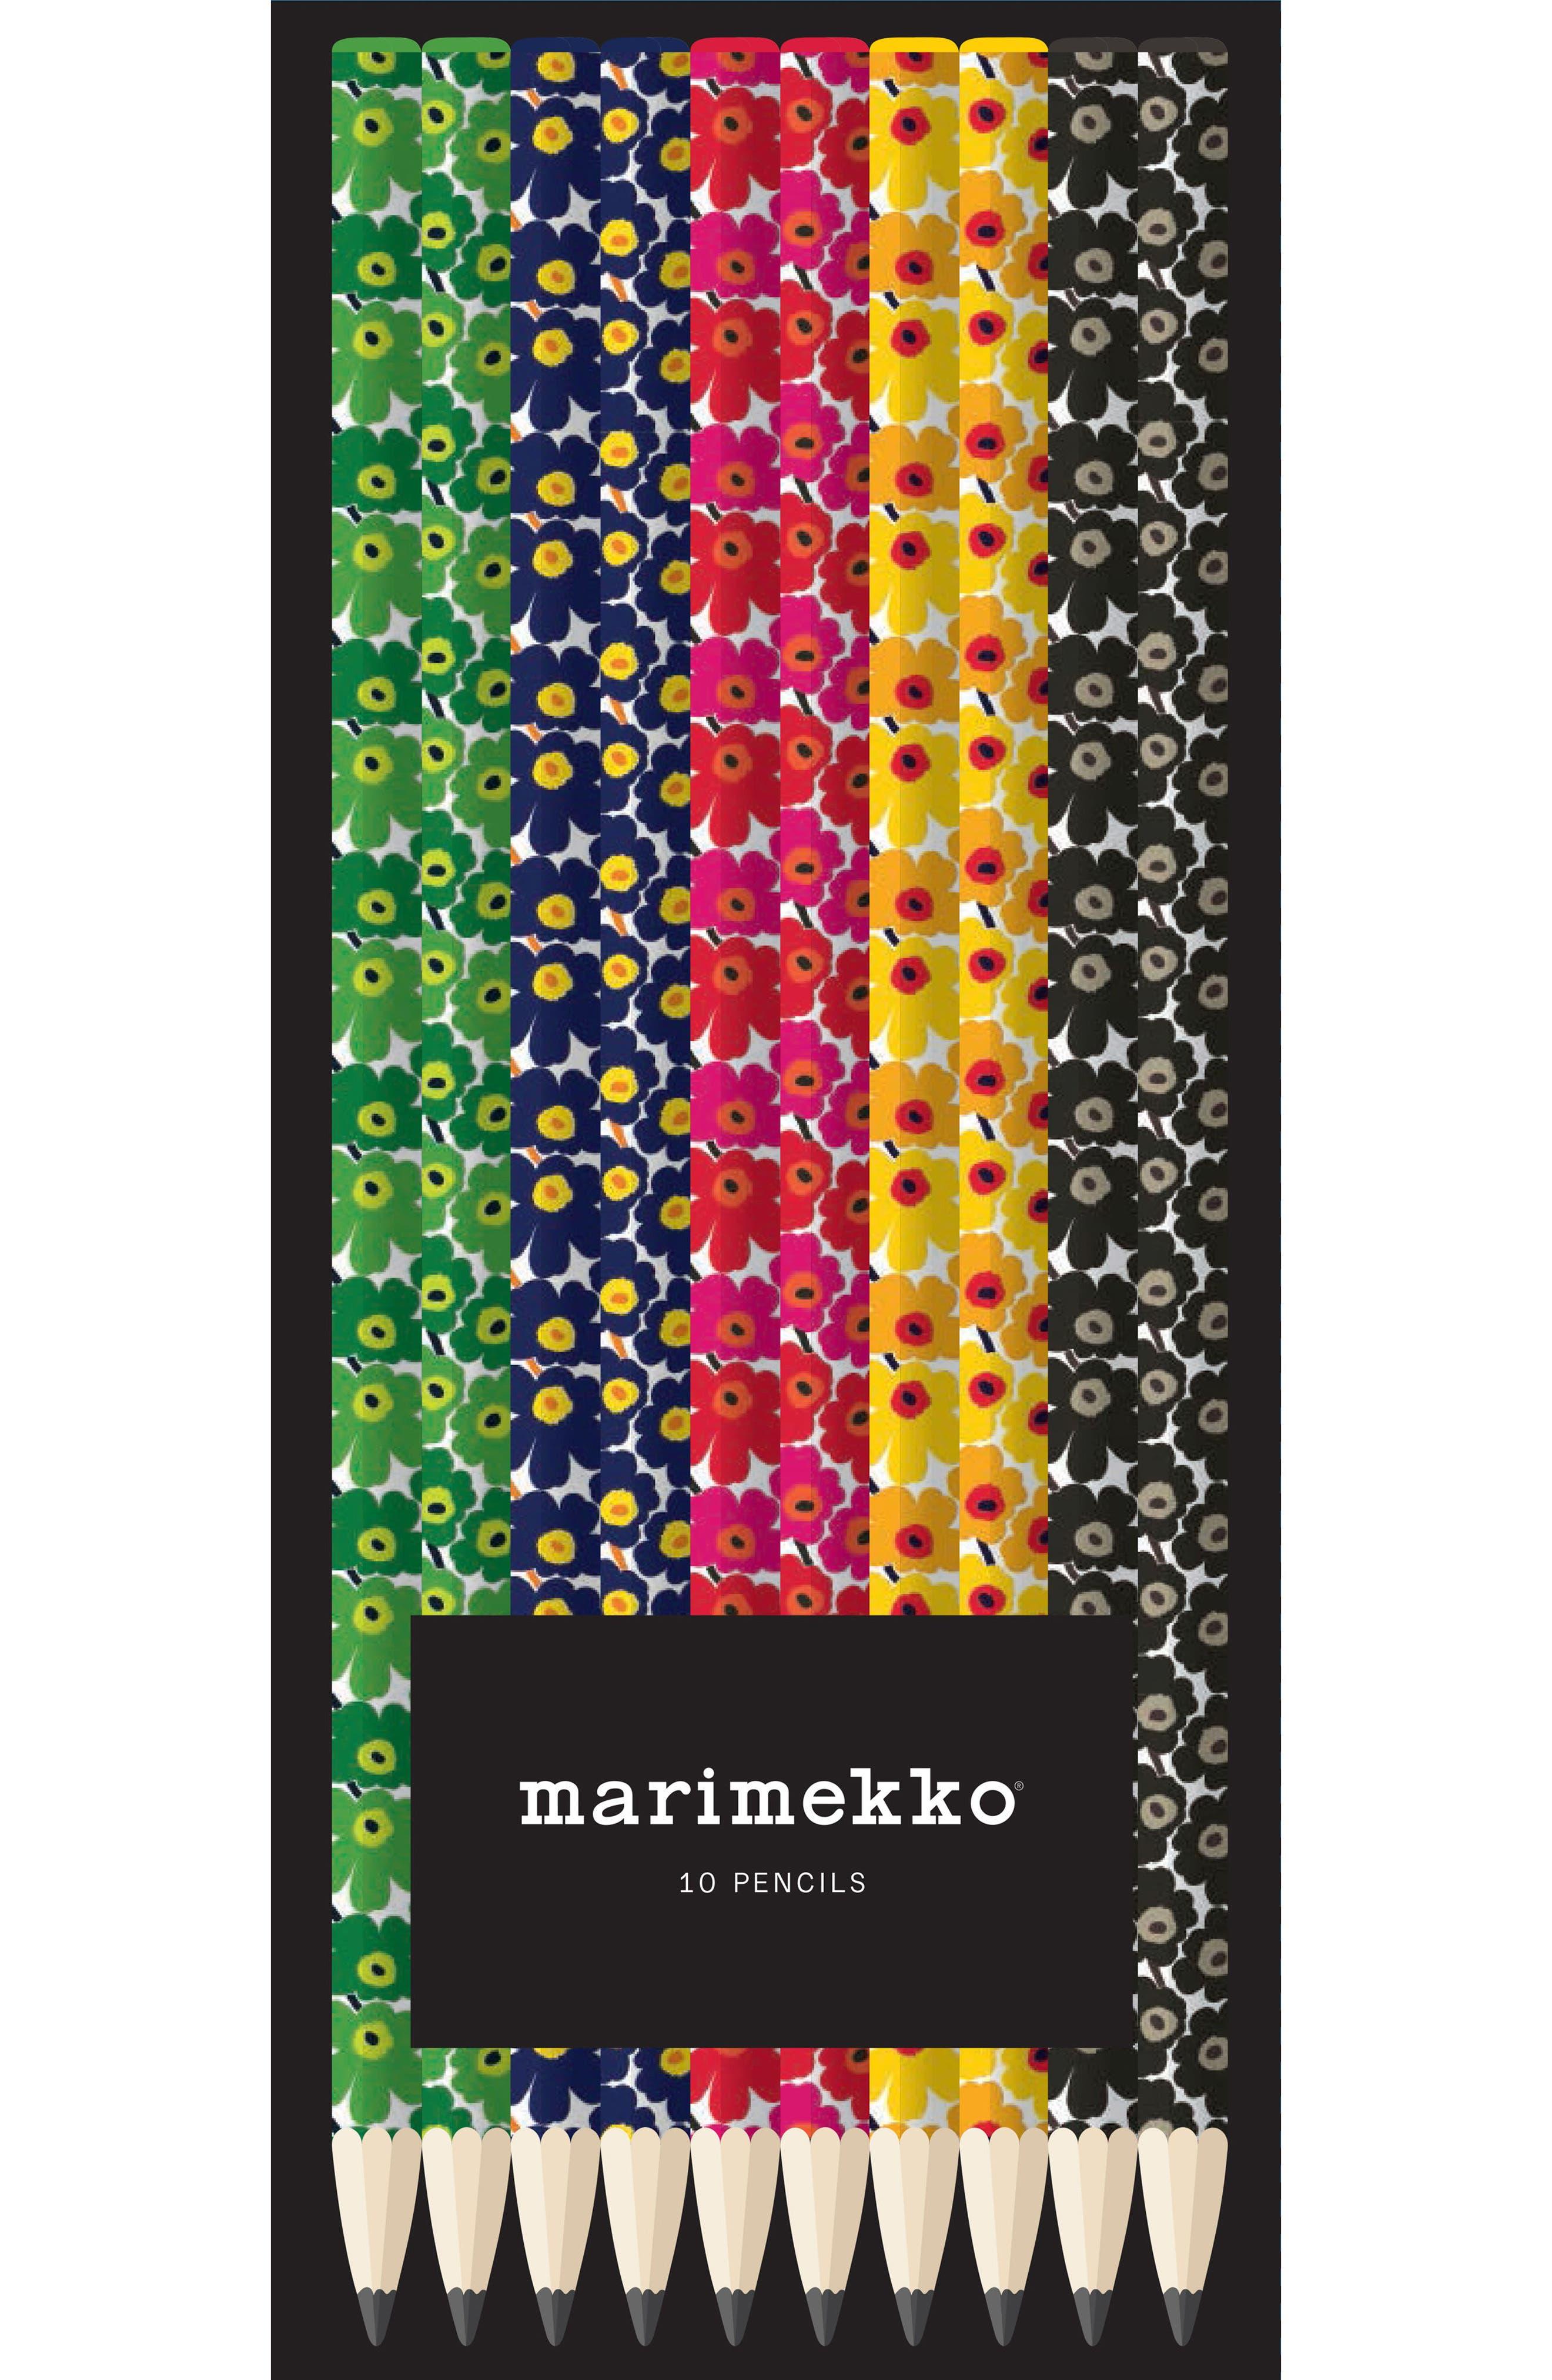 CHRONICLE BOOKS,                             10-Pack Marimekko Pencils,                             Alternate thumbnail 2, color,                             001